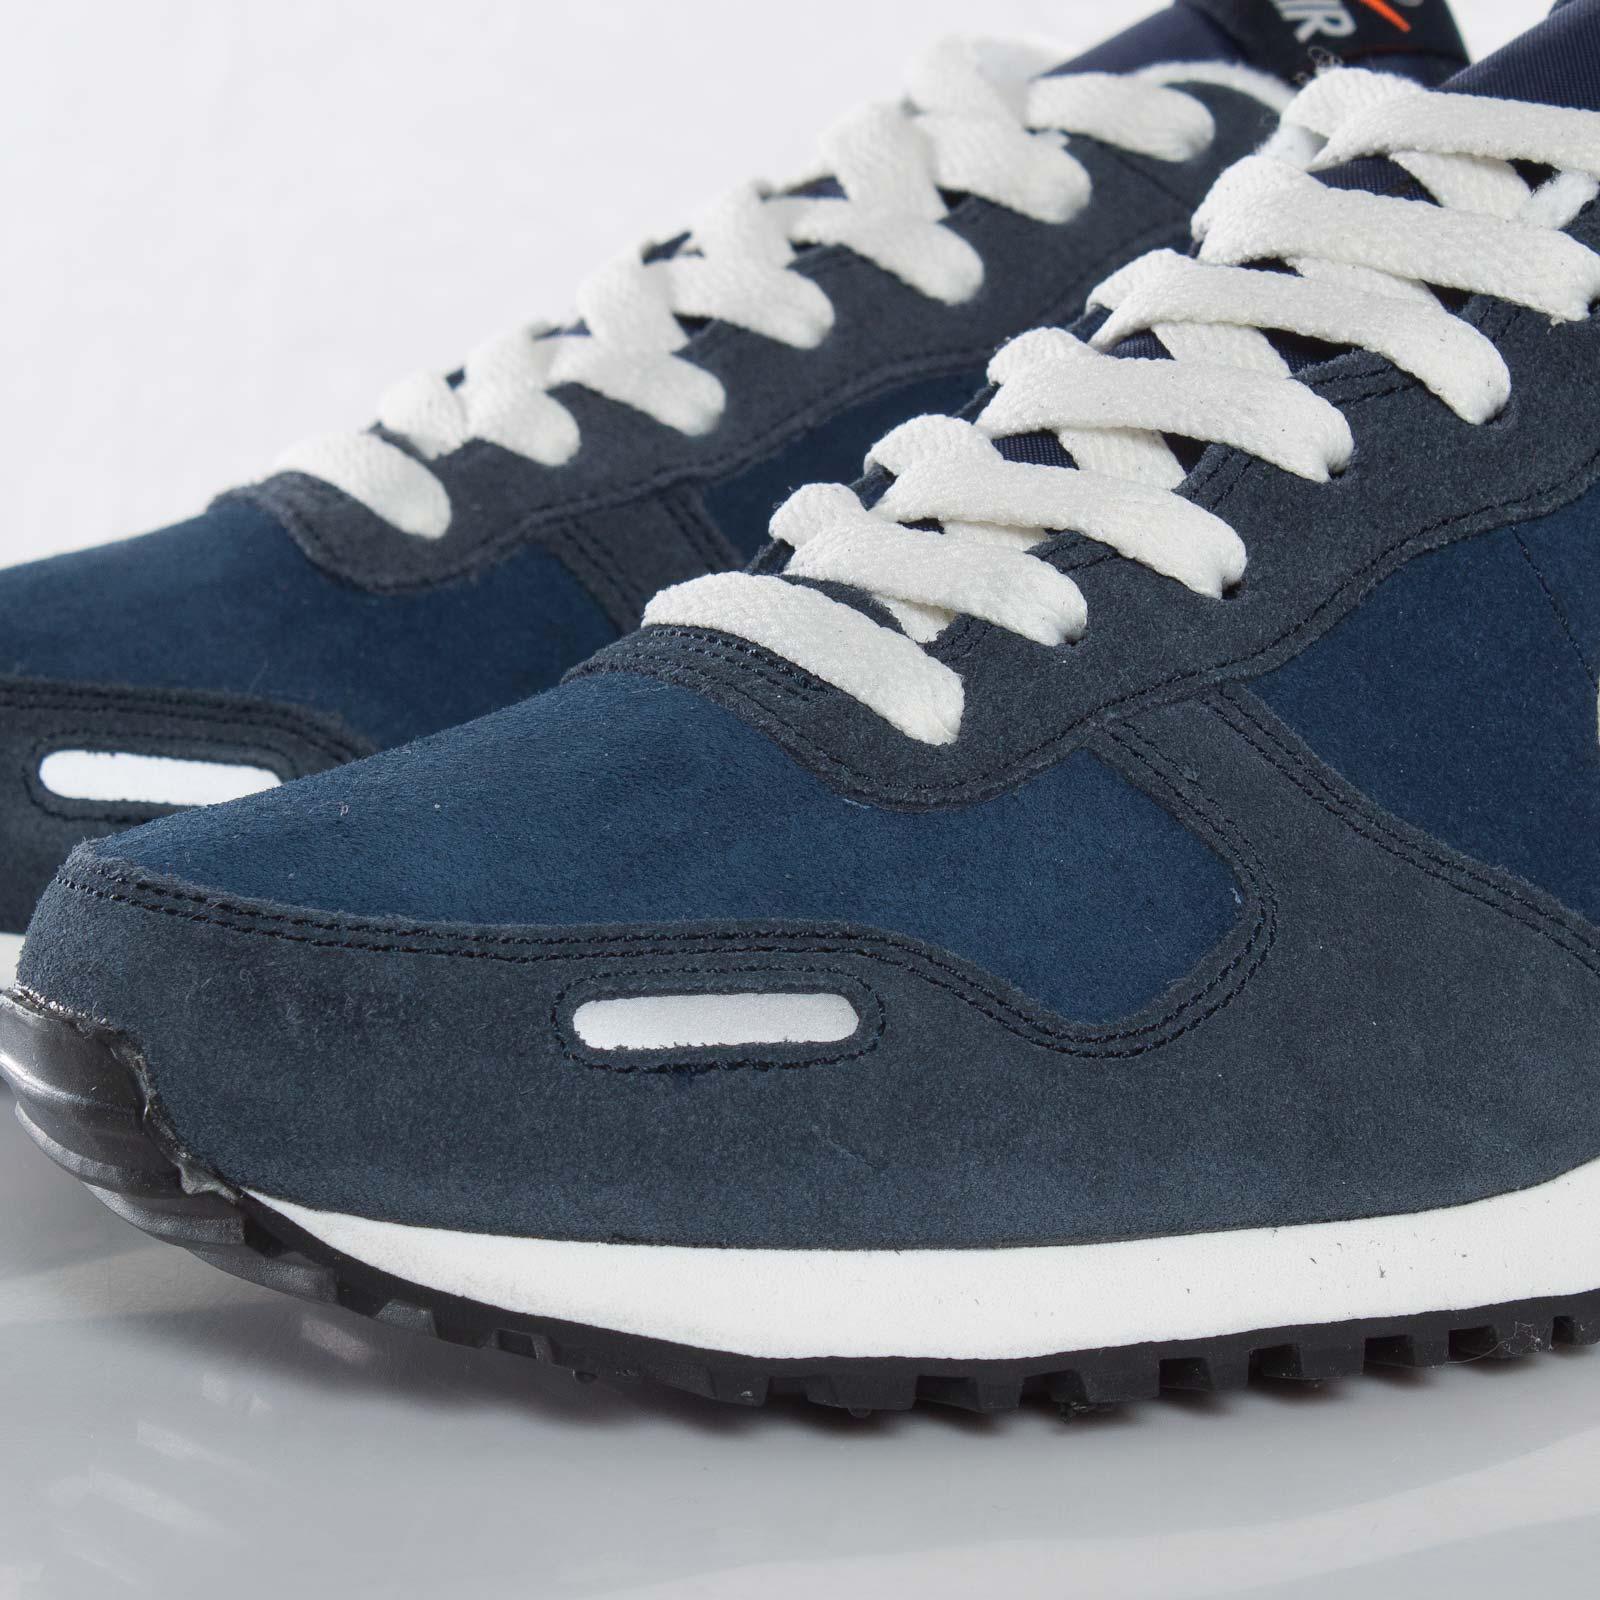 532495 Sneakersnstuff 418 Leather Vortex Nike Air 1c3uTKFJl